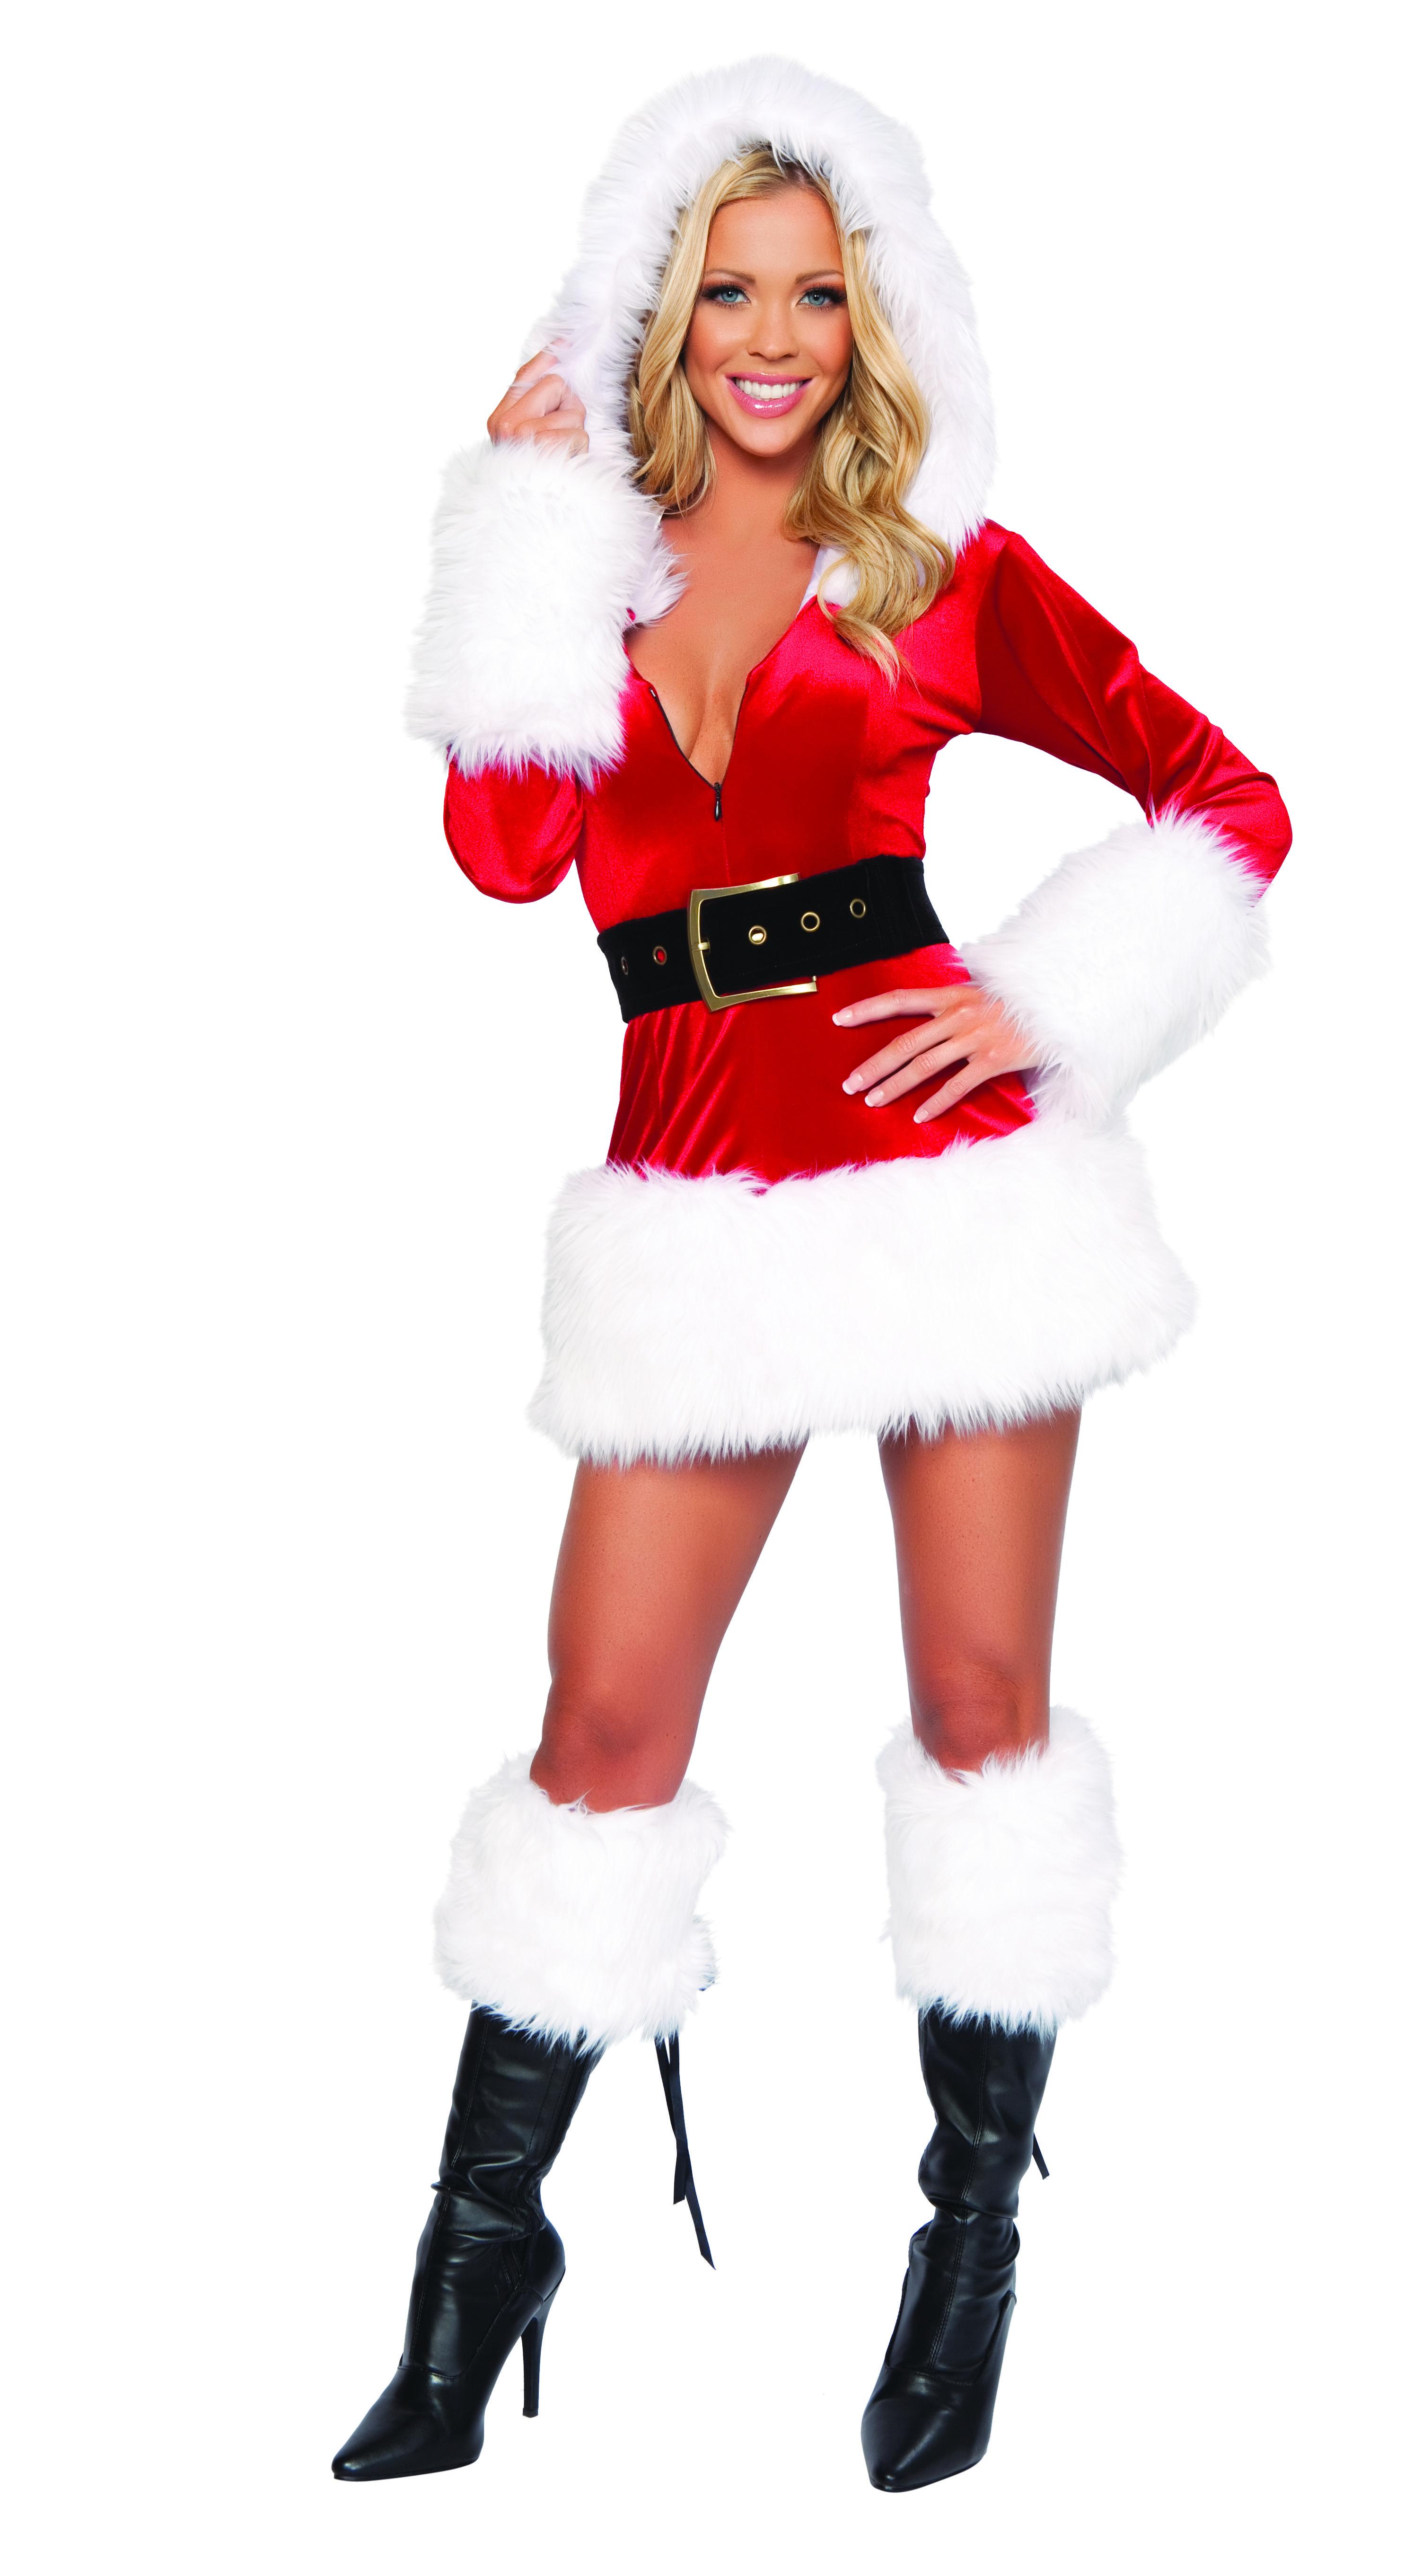 0aaea10097c5 Sexy Santa Crawl Outfit. Sexy Santa Crawl Outfit Christmas Dress Women,  Womens ...